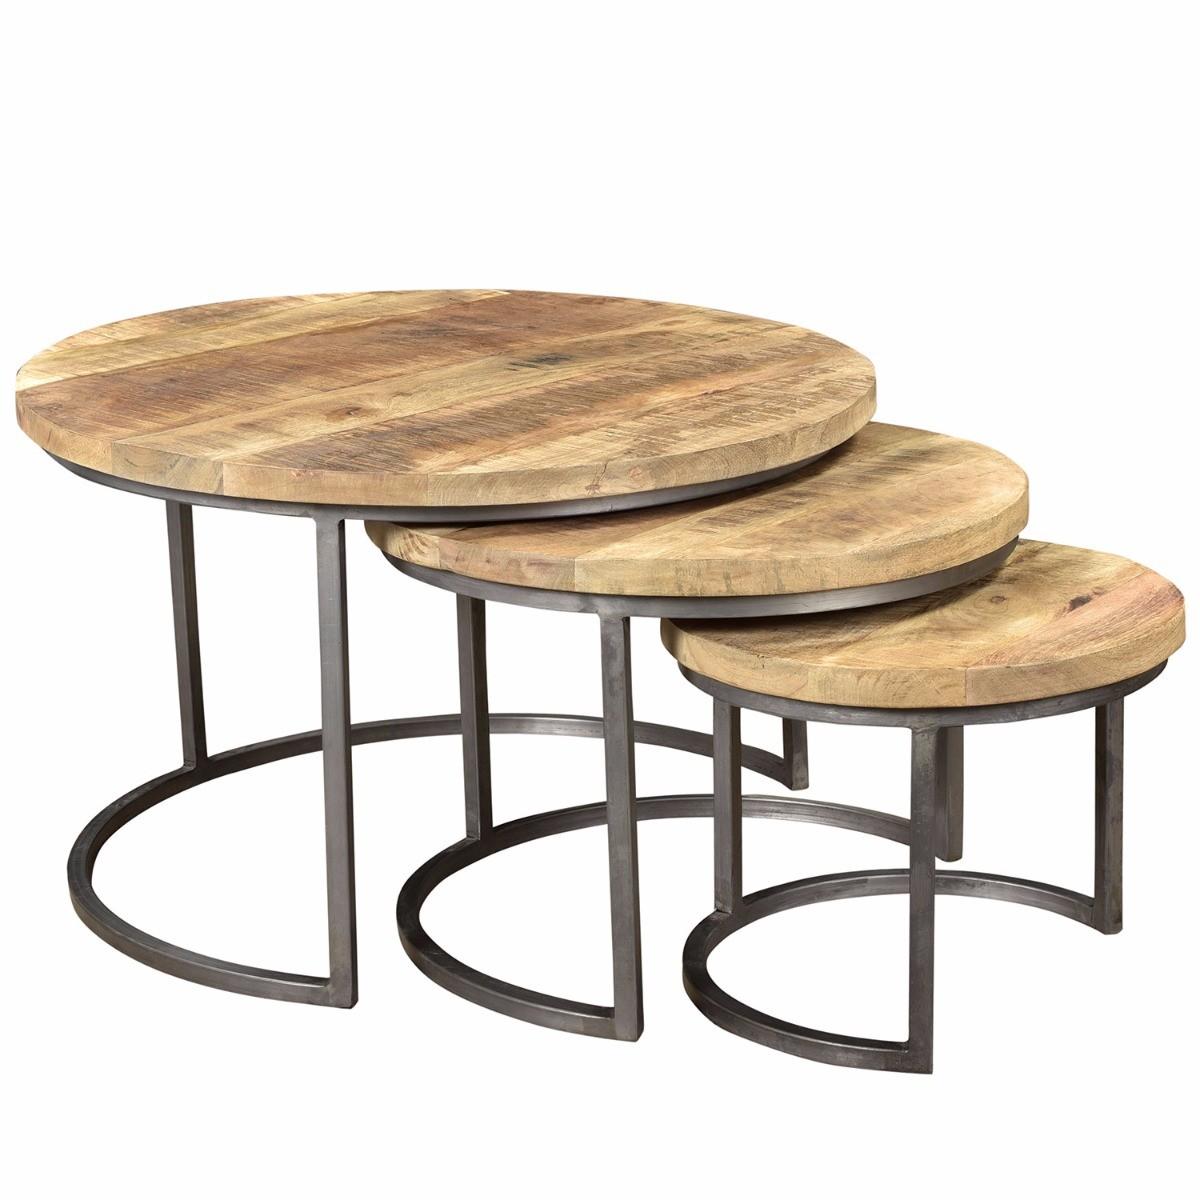 Tafel - Salontafels - S3 mango coffee table  77x77x47 cm